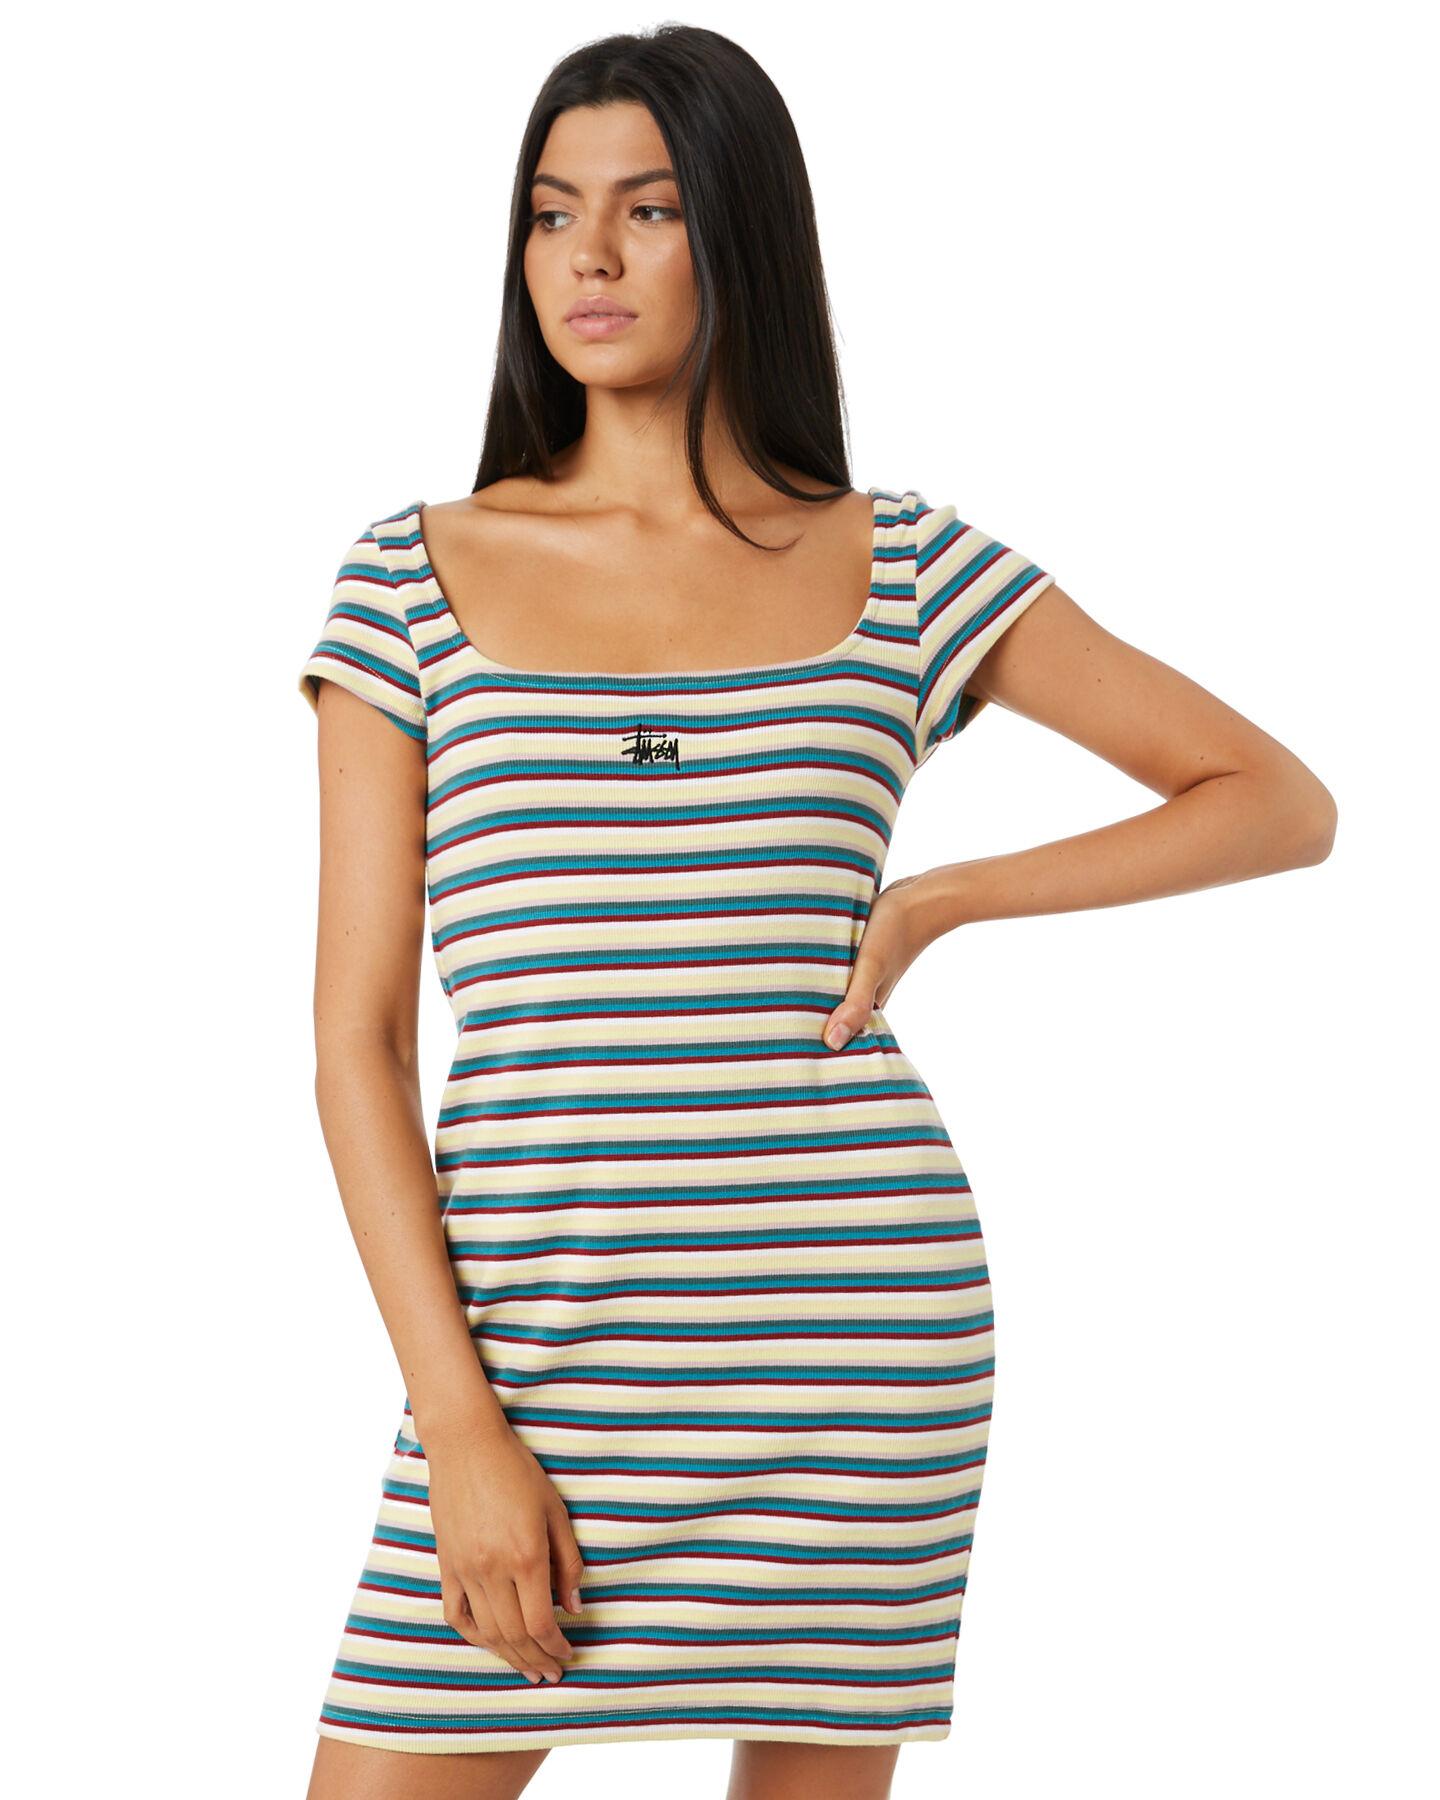 Goddiva Black Blue Stripe Party Club Stretch Bodycon Mini Dress 8 10 12 14